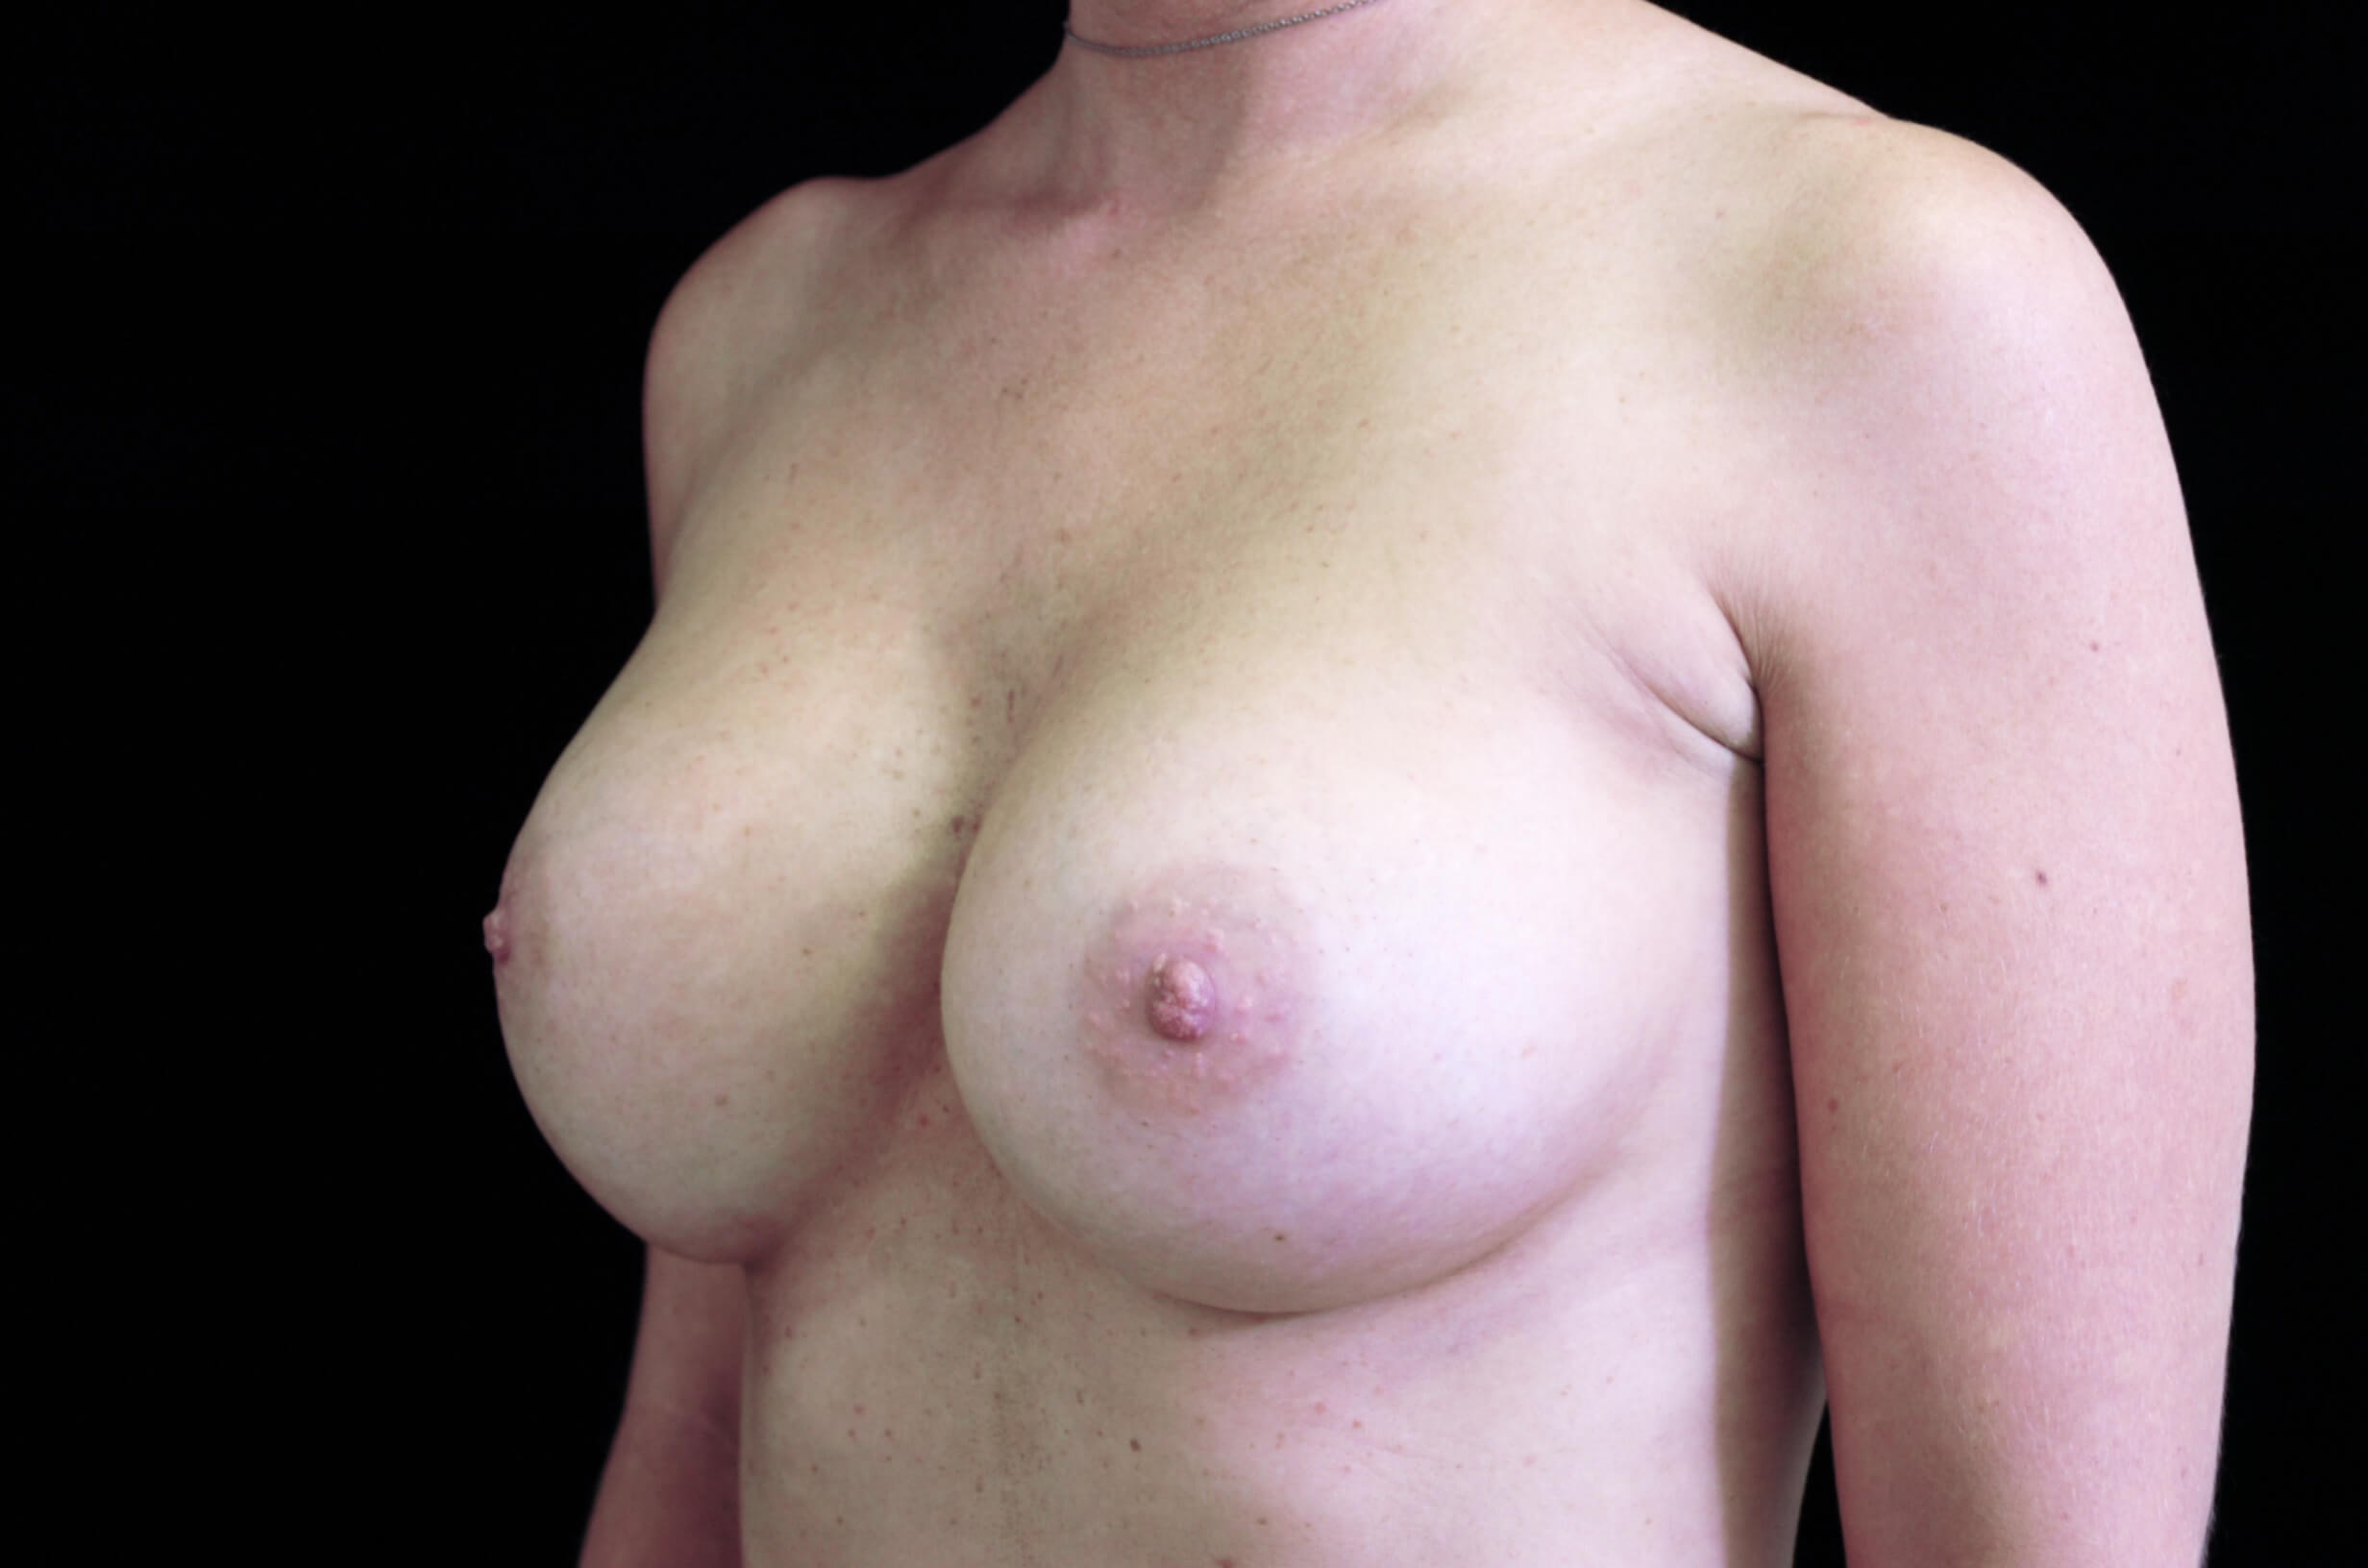 DALLAS, TEXAS WOMAN HAS BREAST REVISION SURGERY